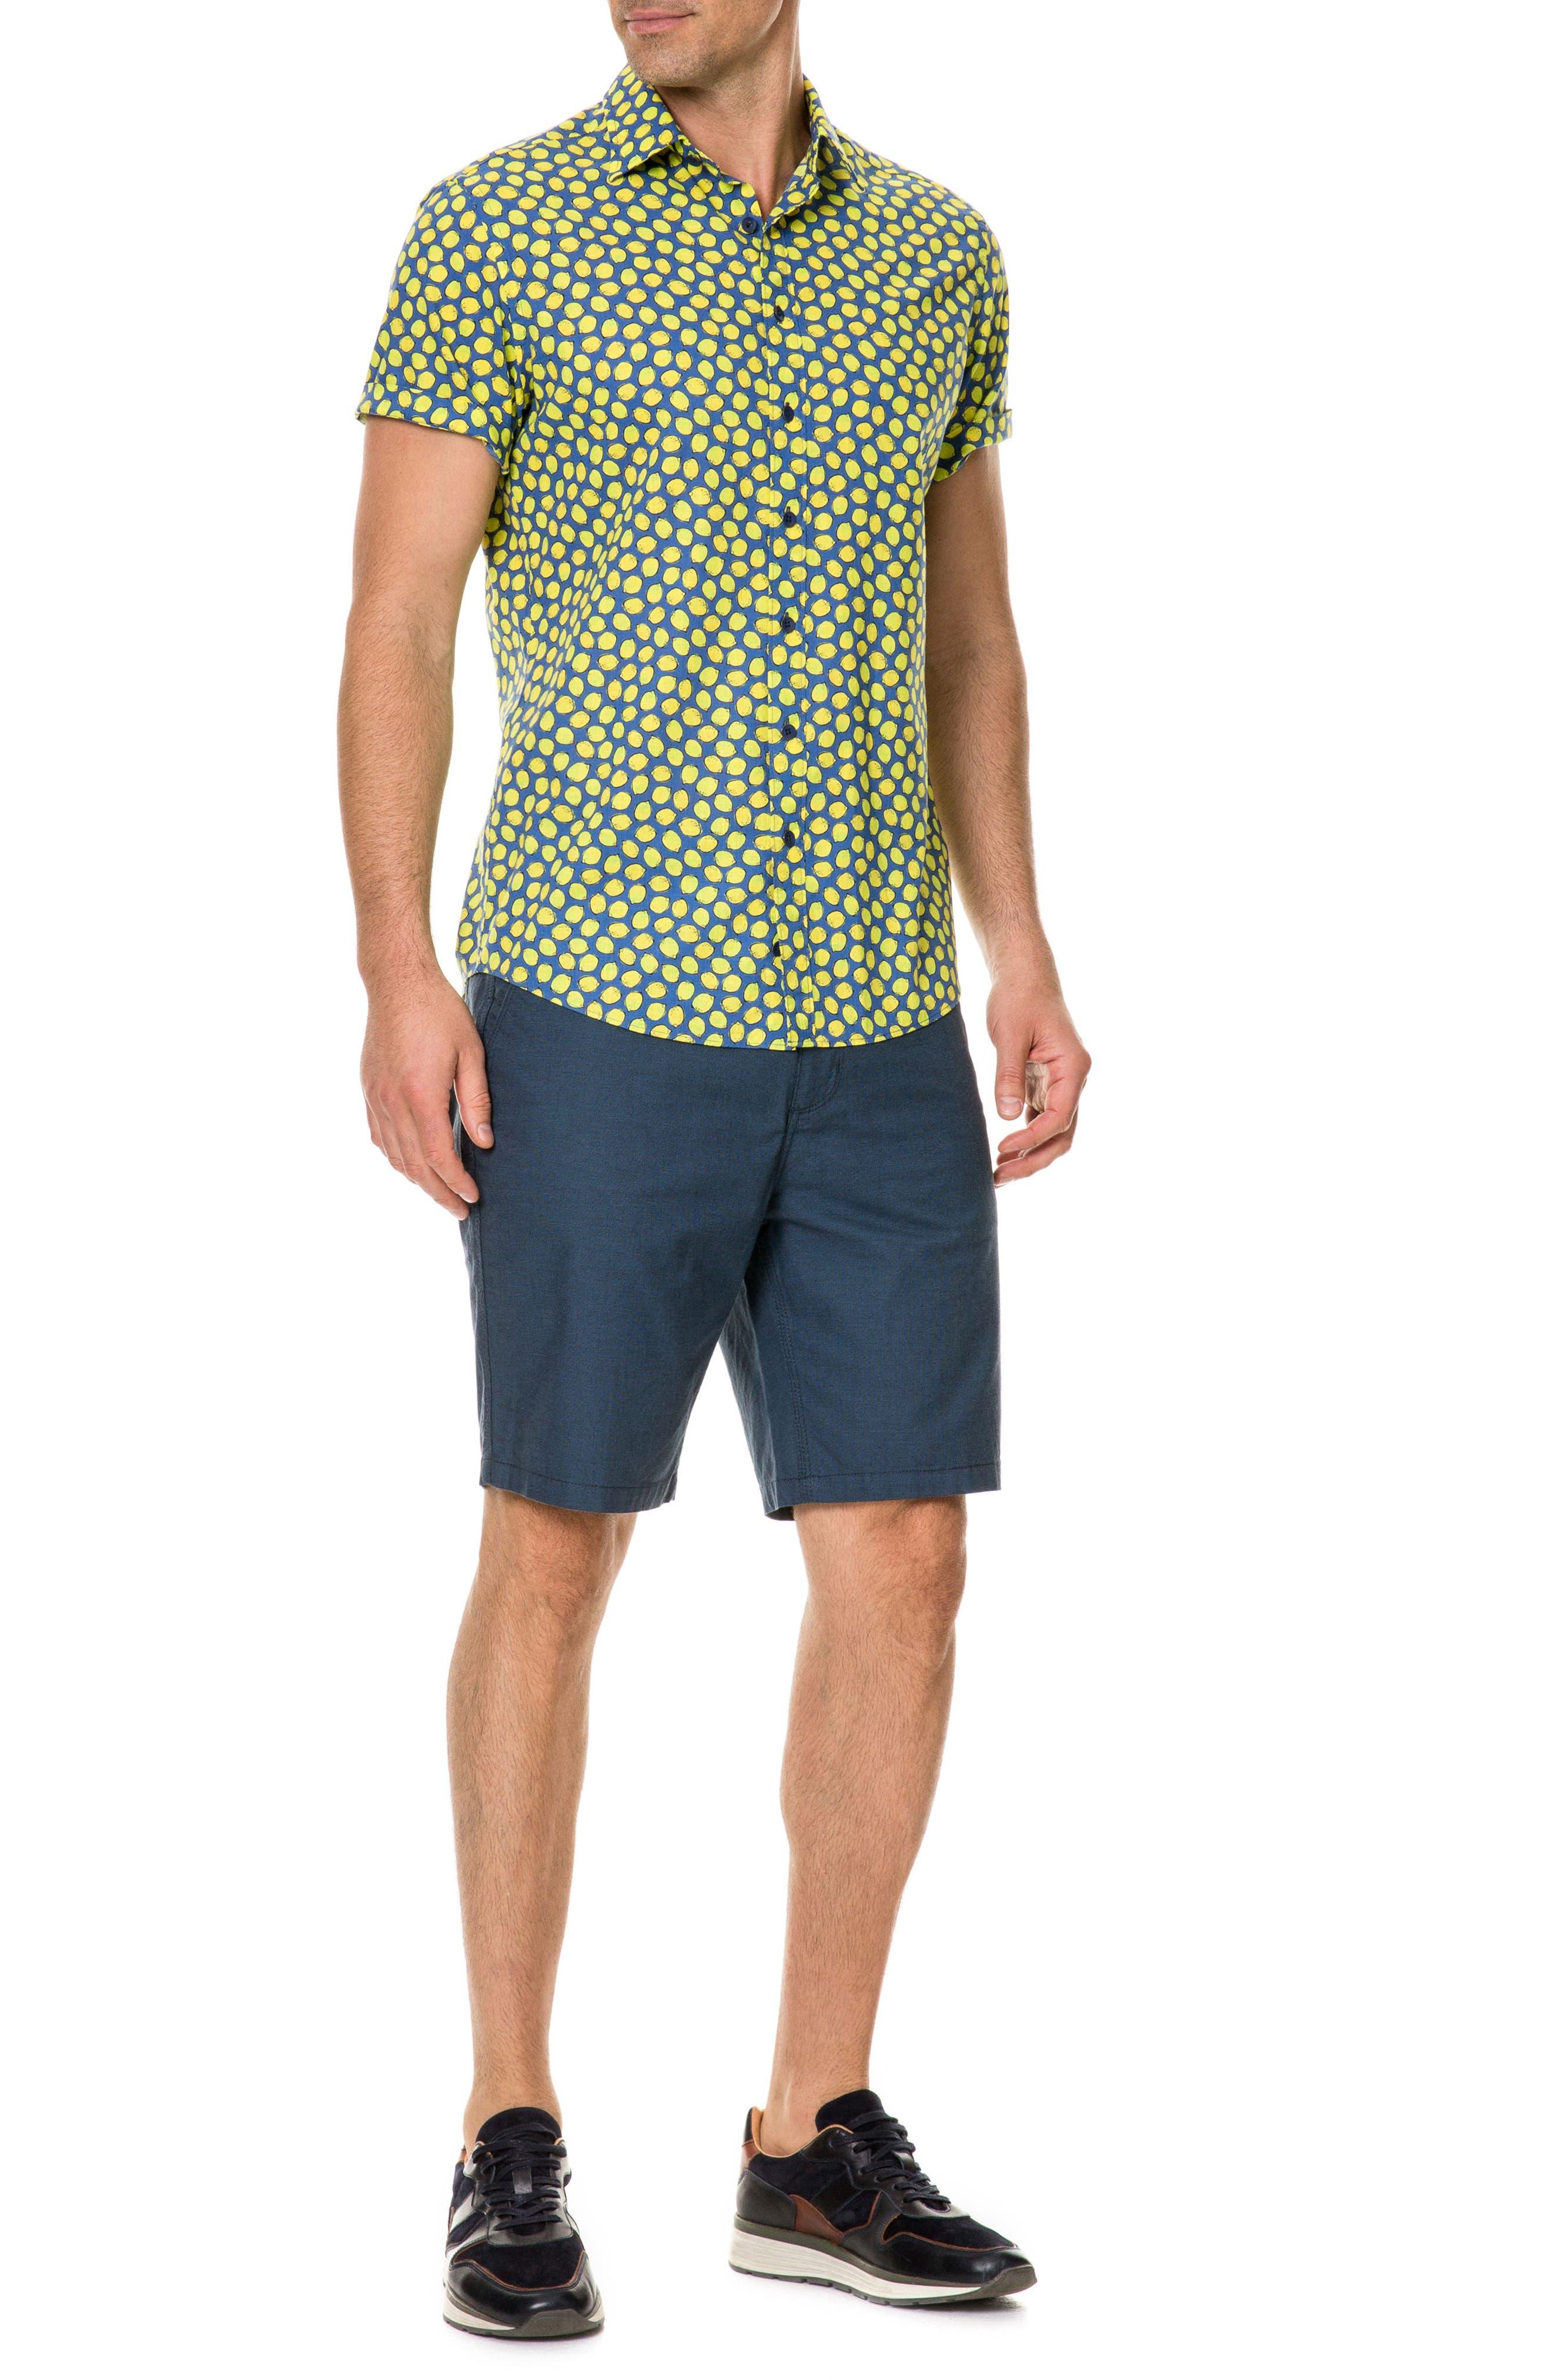 Davis Bay Regular Fit Sport Shirt,                             Alternate thumbnail 5, color,                             Azure